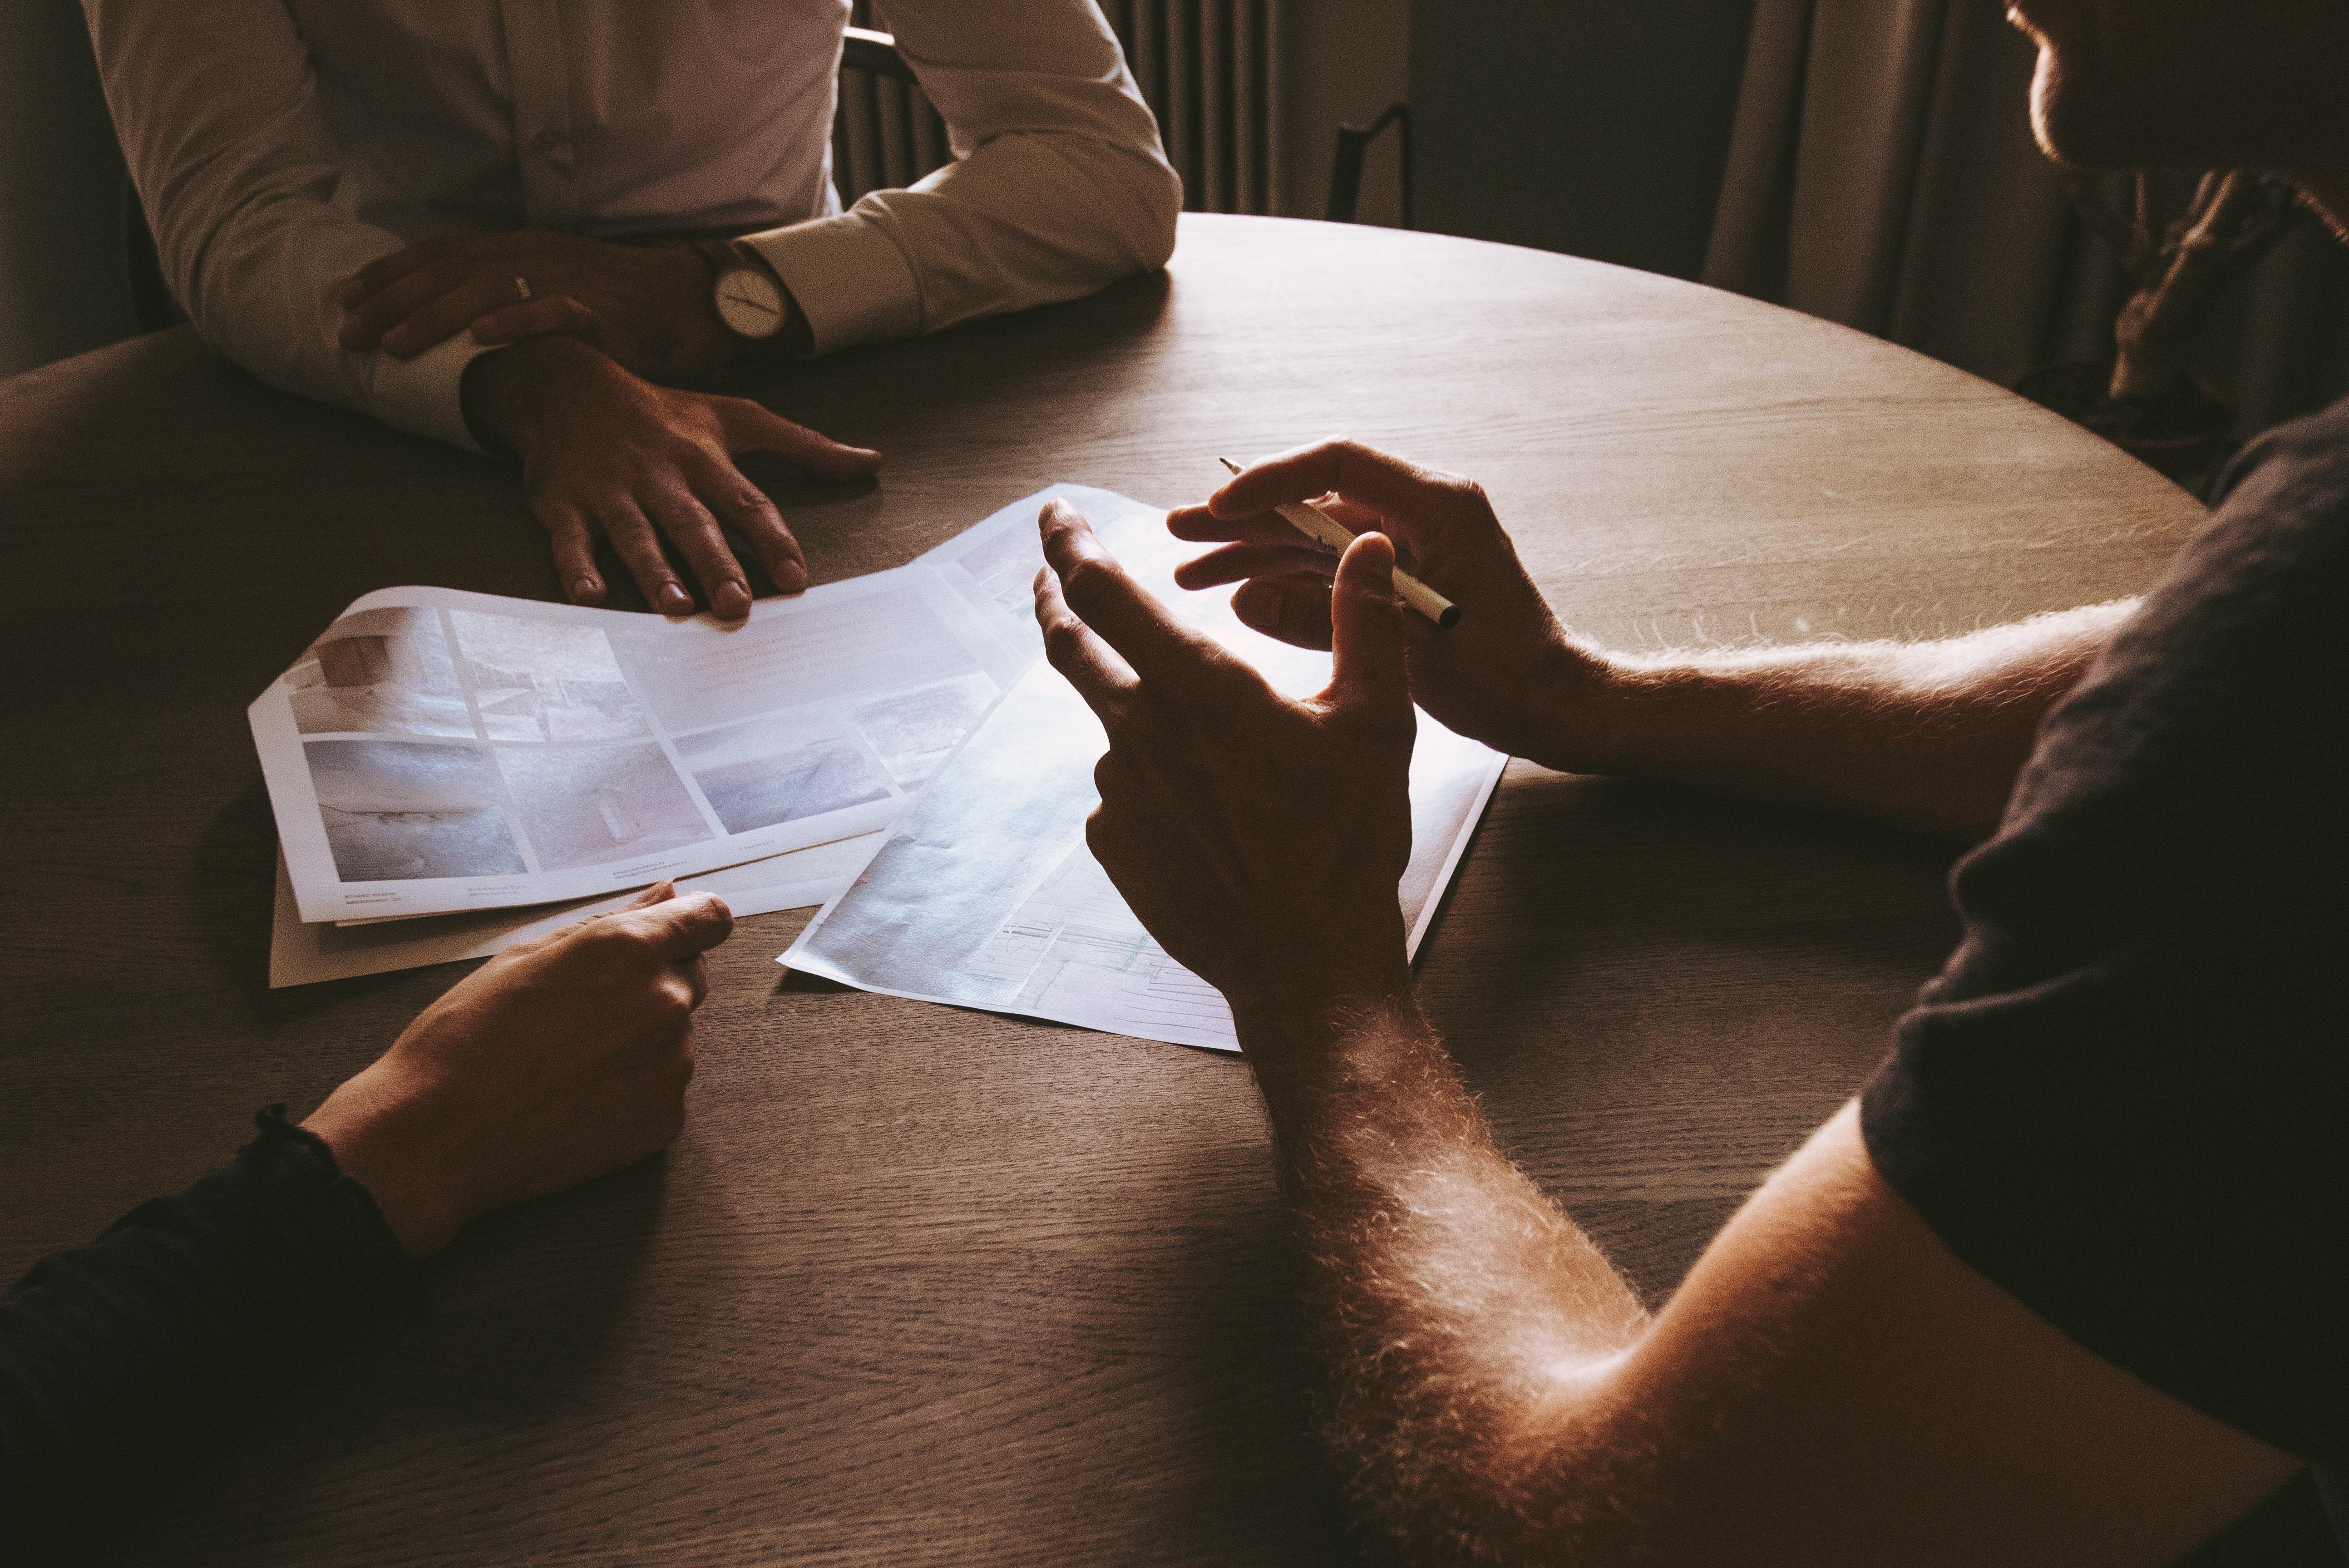 Decisions Decisions: Speeding Up Interdepartmental Communications